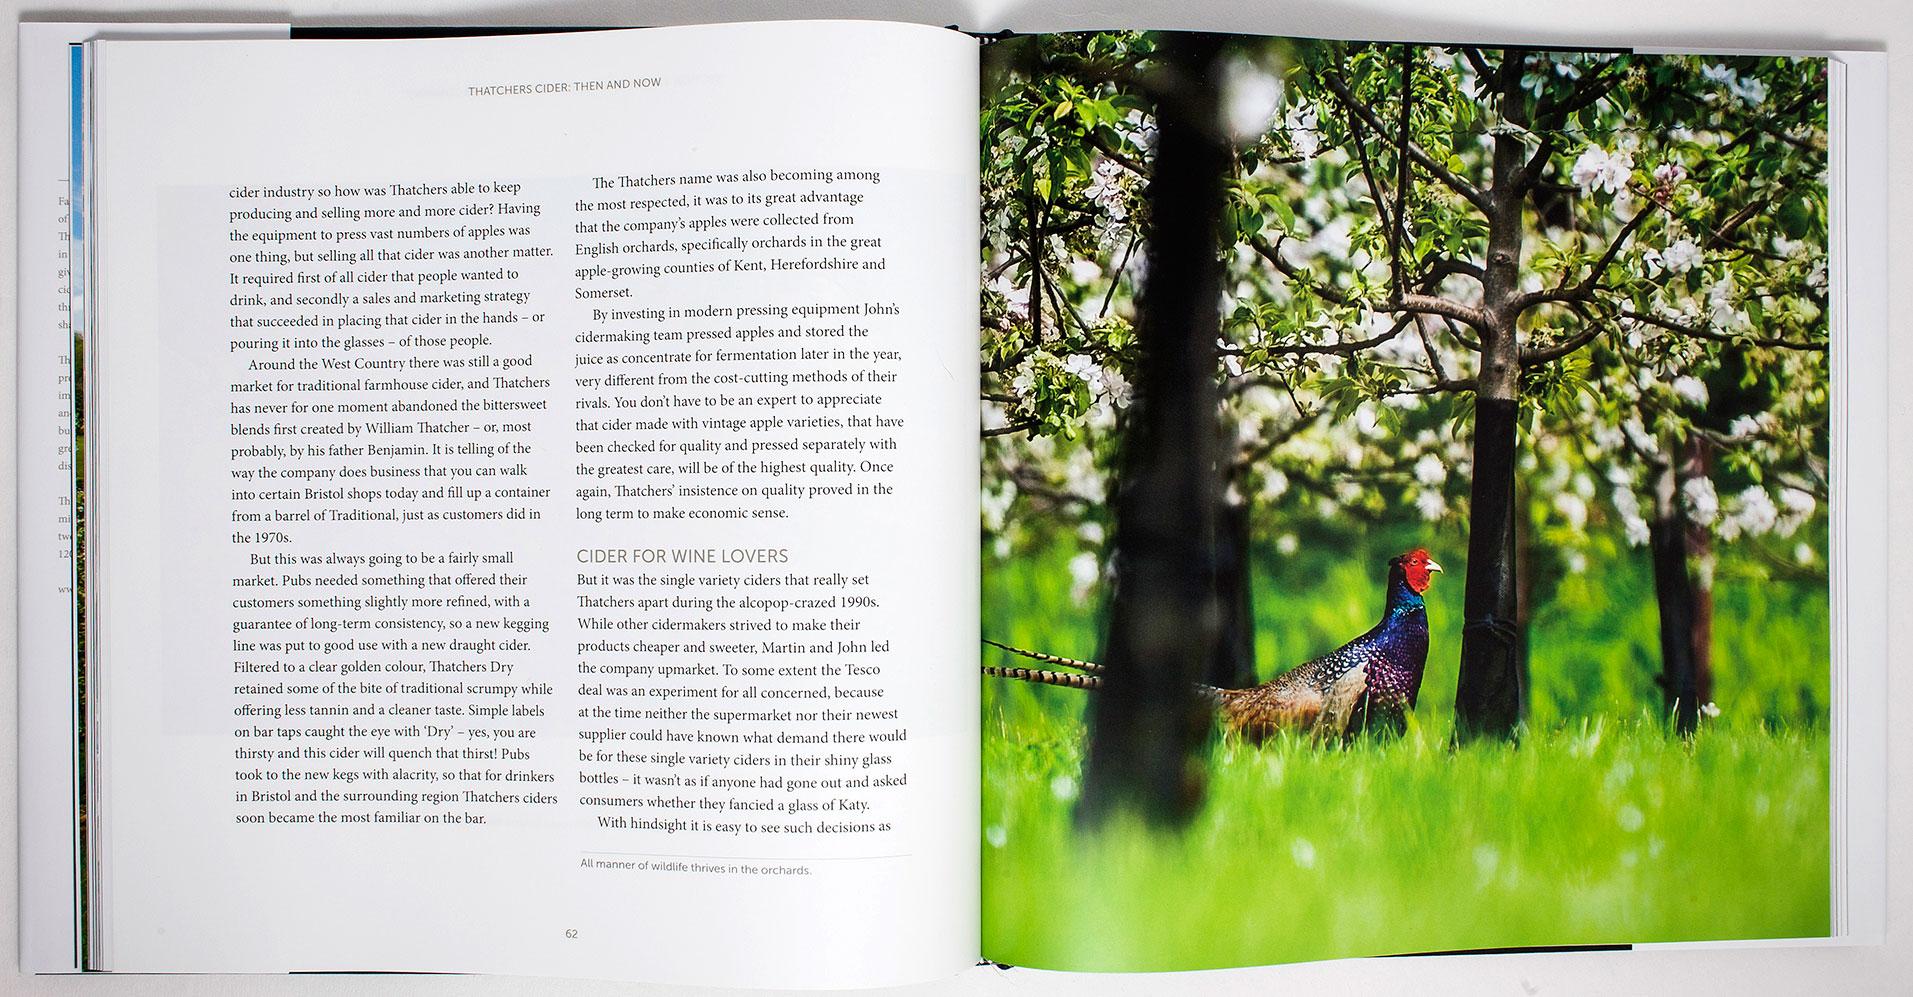 epm-print-management-bristol-food-books-thatchers-4.jpg